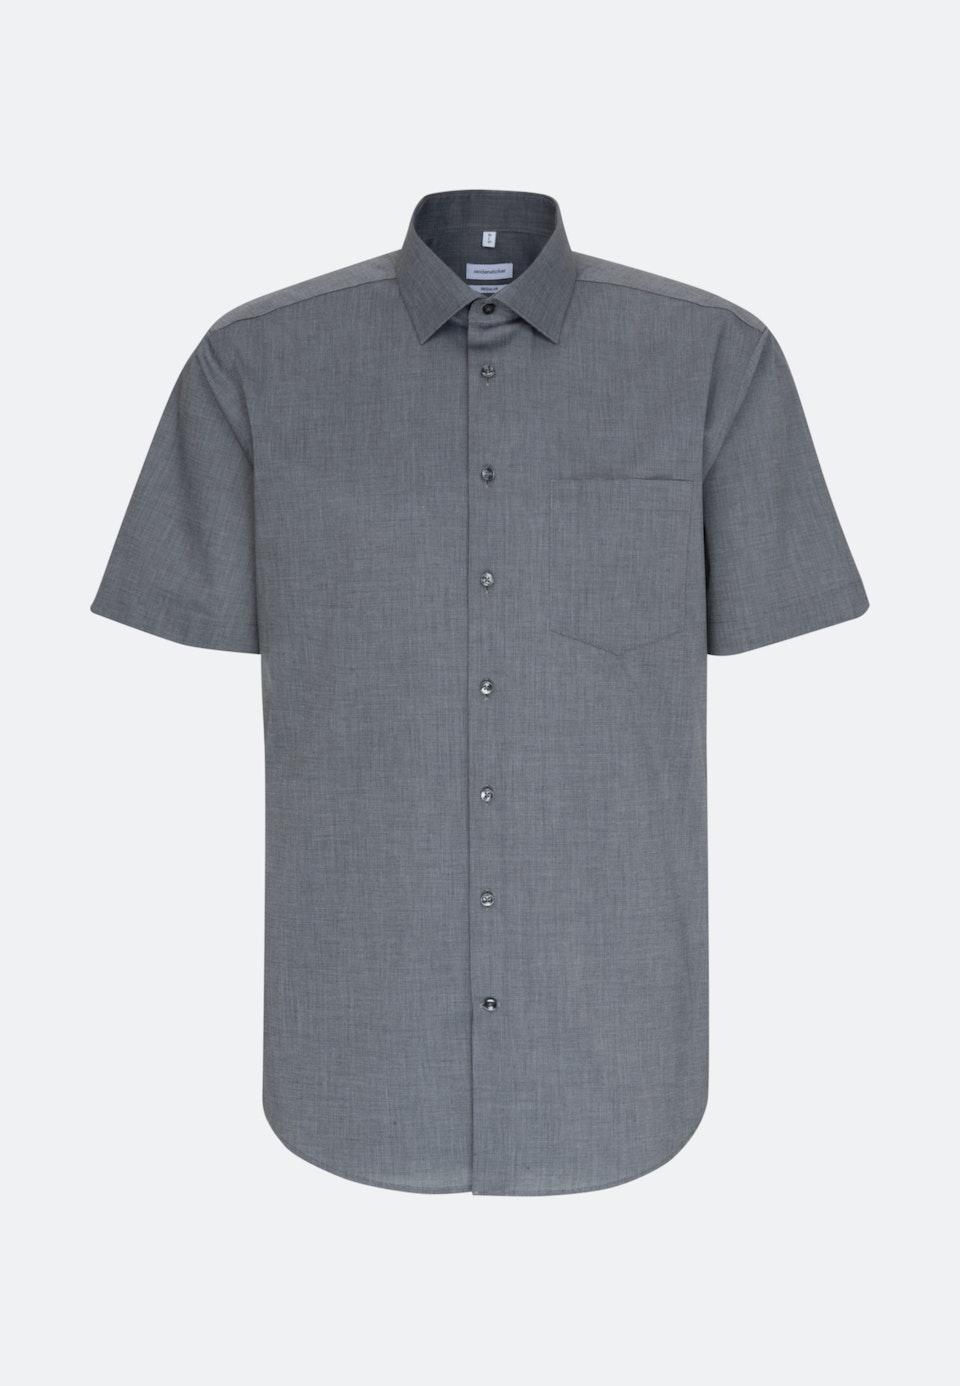 Bügelfreies Fil a fil Kurzarm Business Hemd in Regular mit Kentkragen in Grau |  Seidensticker Onlineshop